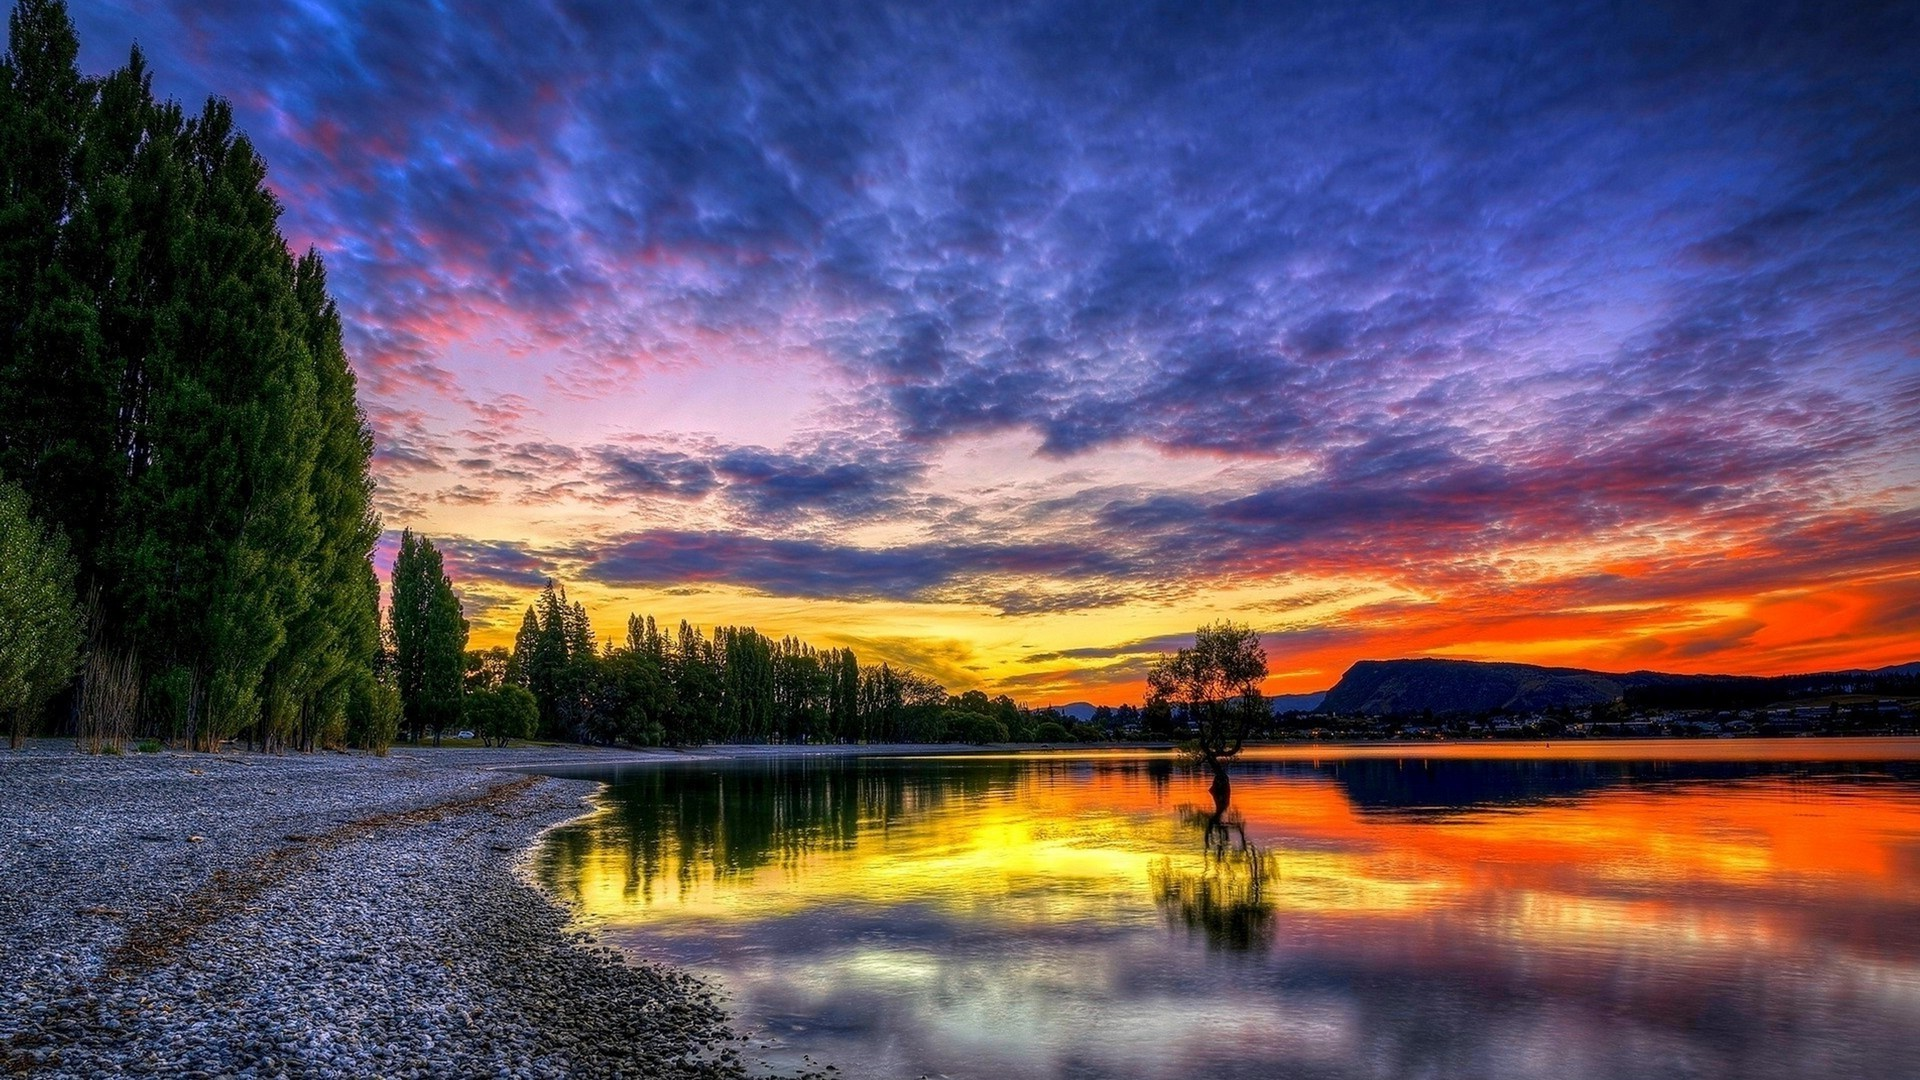 Twilight landscape beautiful sunset coast desktop wallpaper Gallery 1920x1080